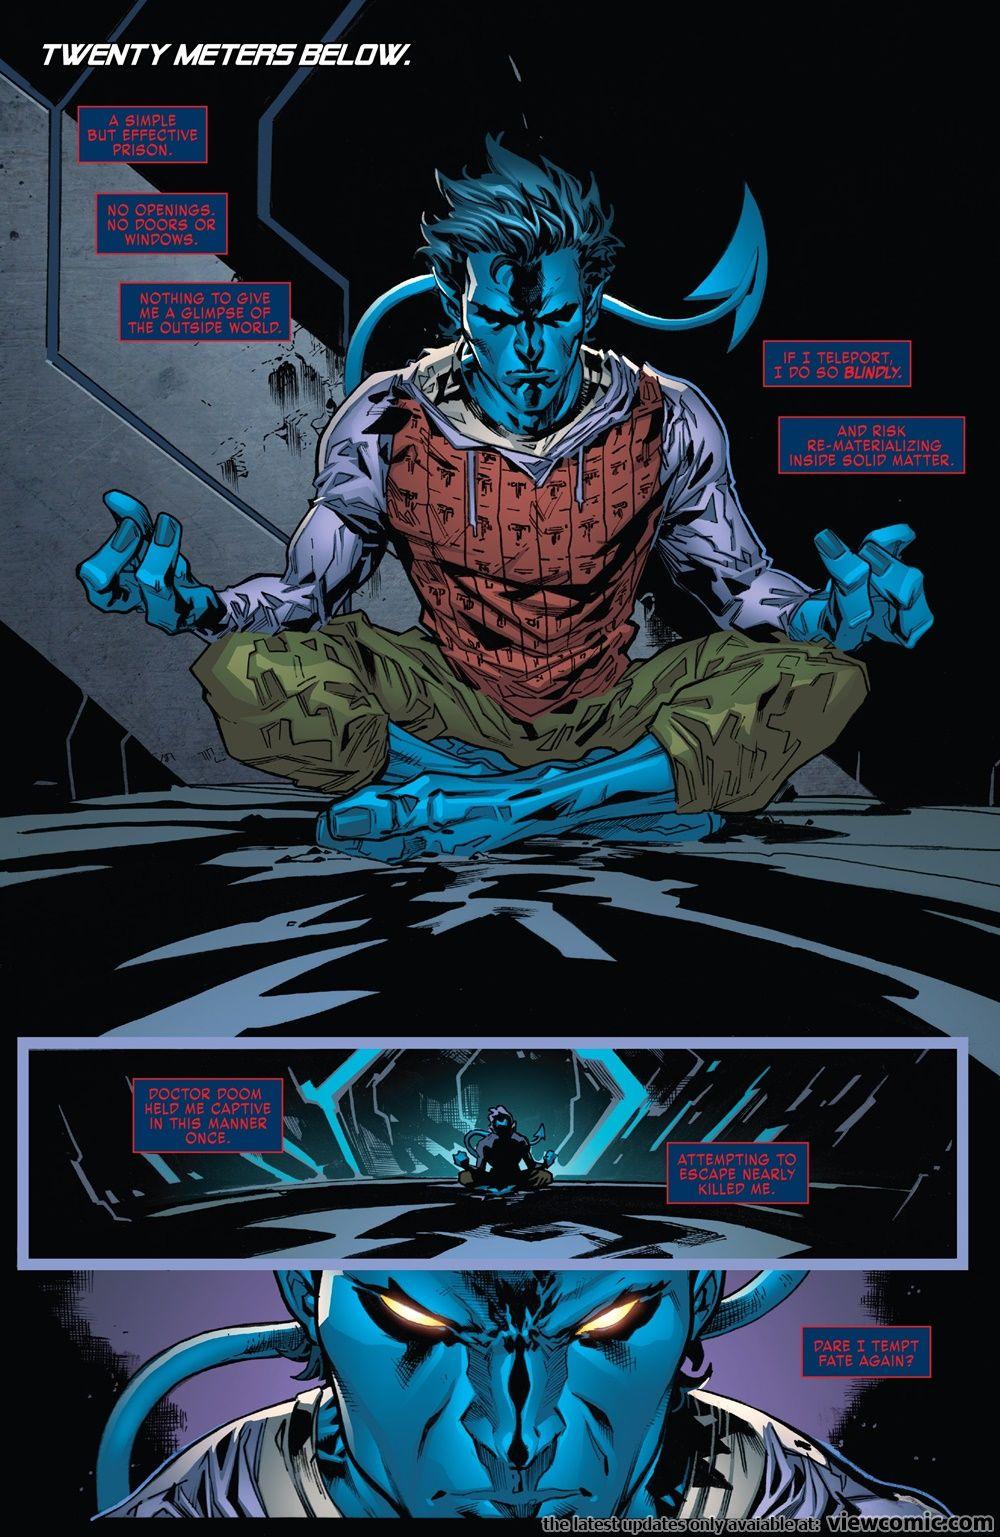 X Men Gold 2017 17 Kurt And Kitty Are Captured Https Readcomiconline To Comic X Men Gold Issu Nightcrawler Comic Marvel Superheroes Nightcrawler Marvel